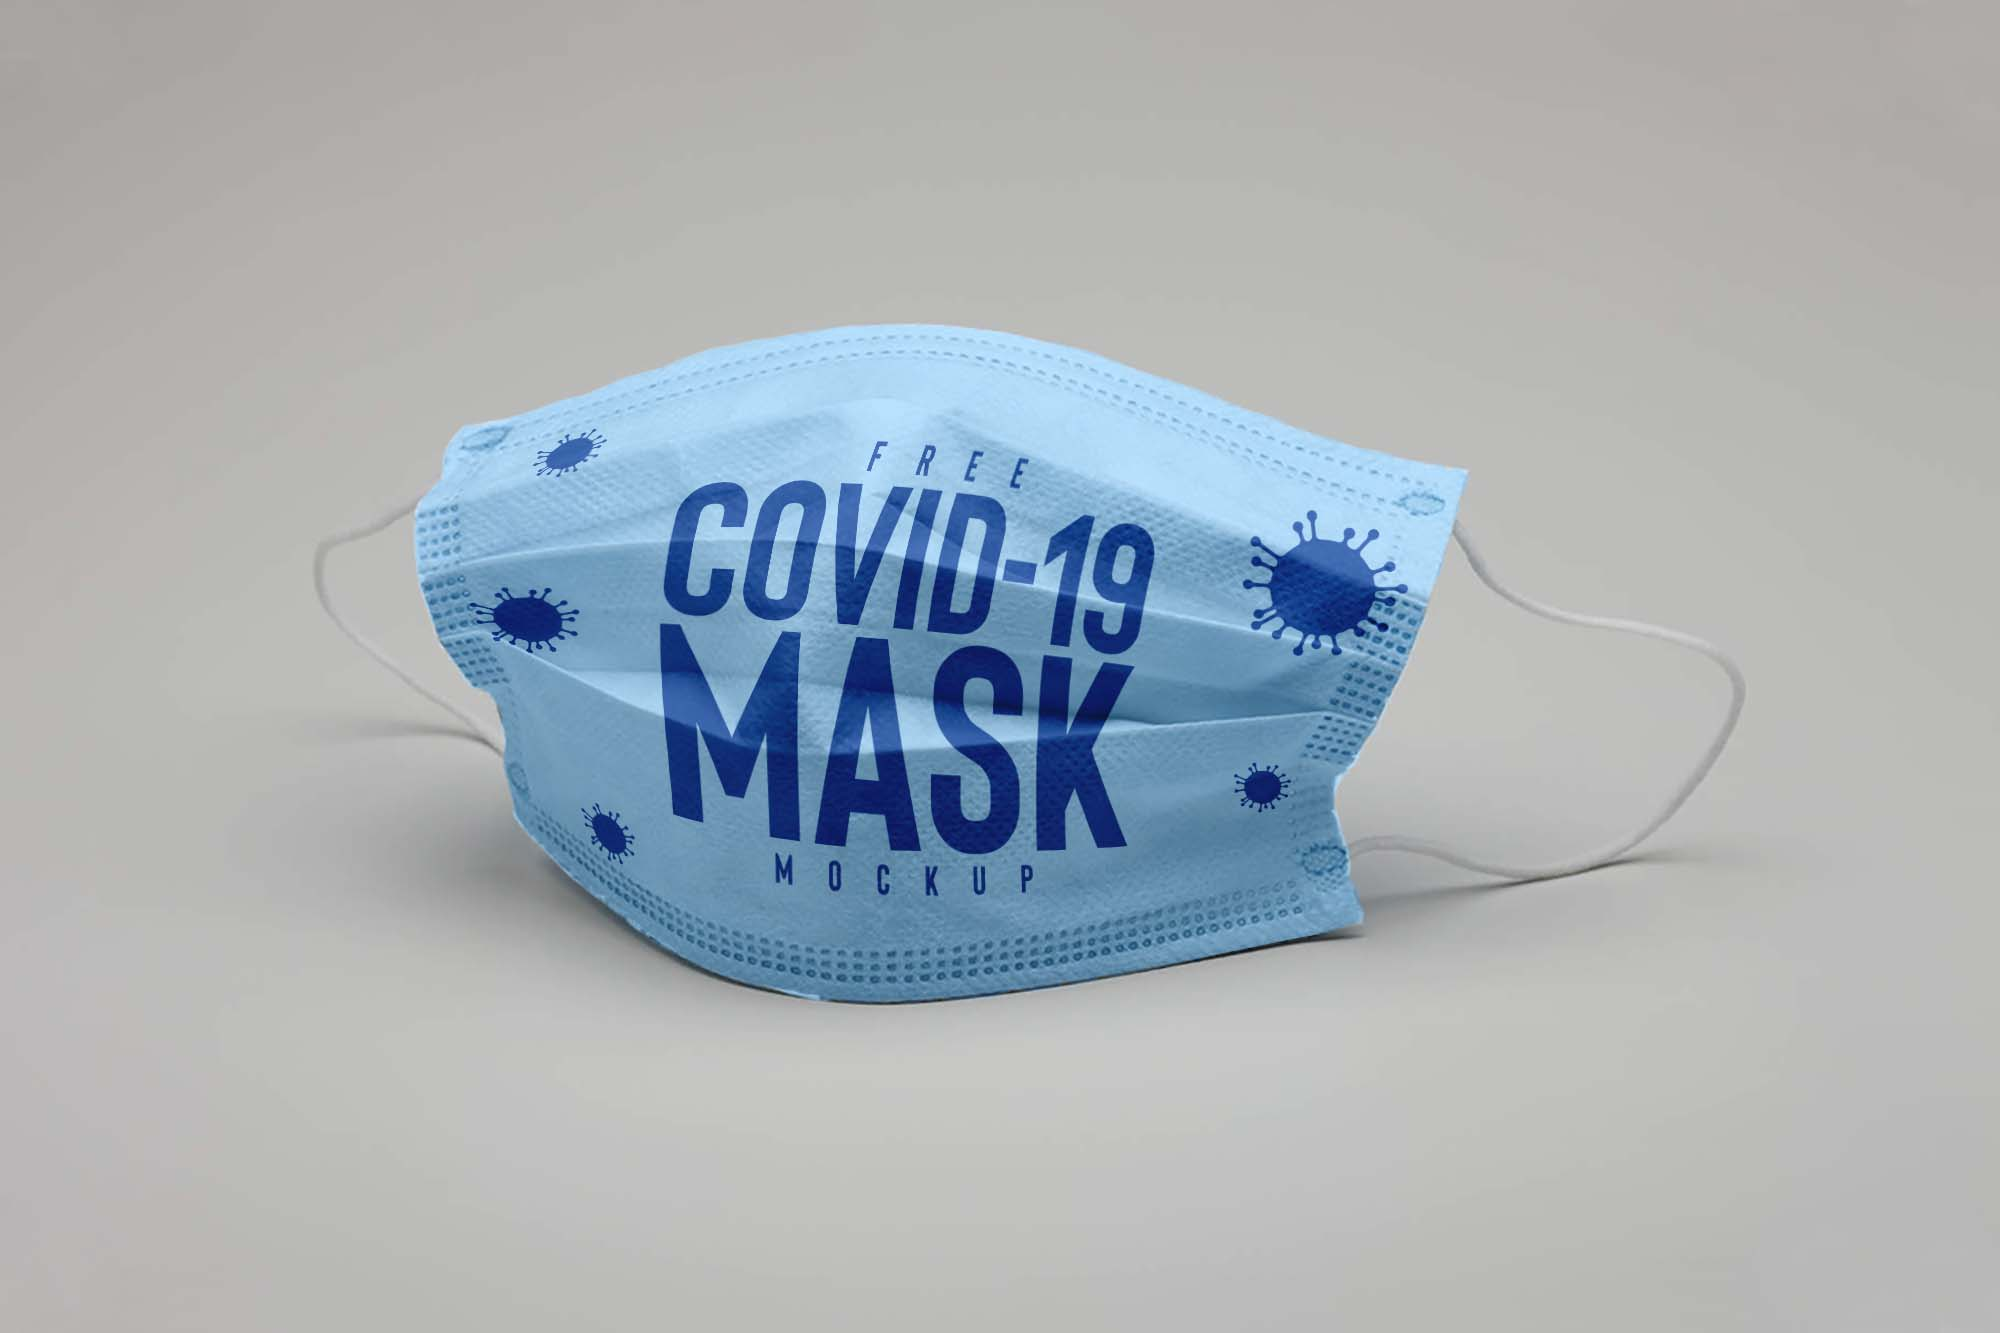 Covid-19 Face Mask Mockup